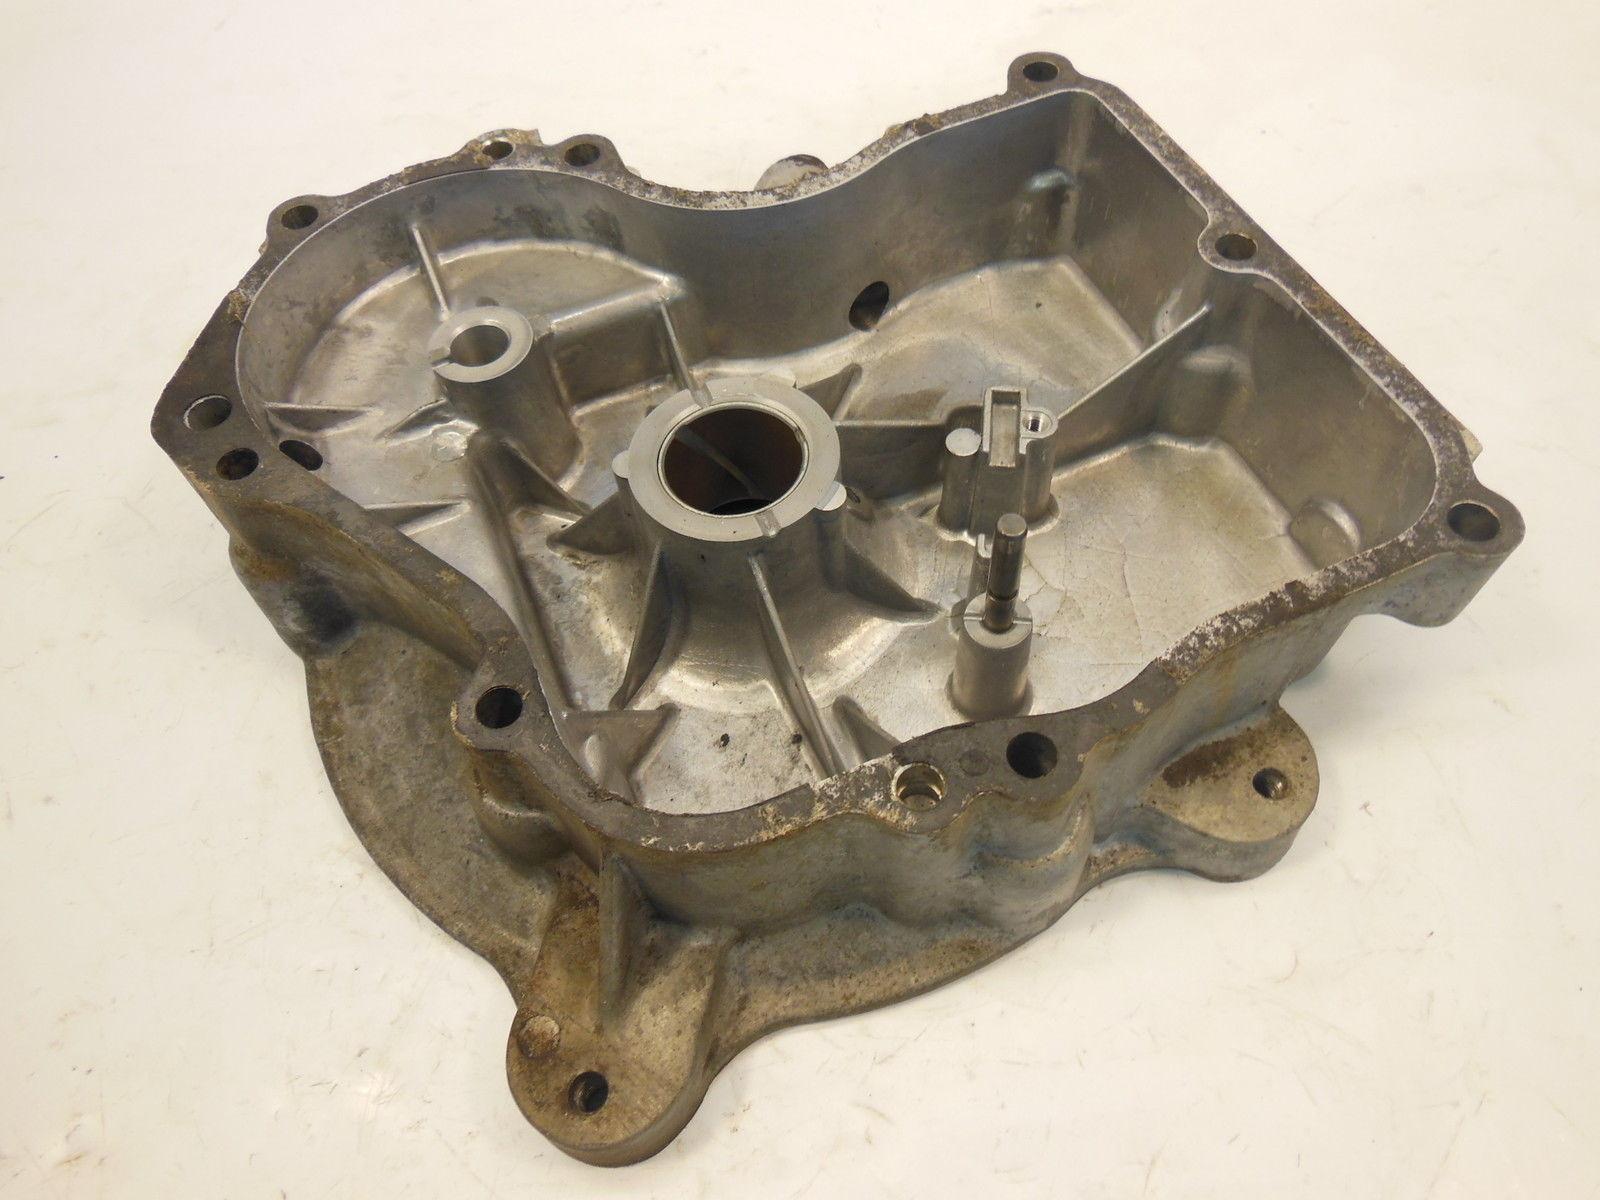 Kawasaki 9HP John Deere RX75 FC290 FC290V Crankcase sump ...